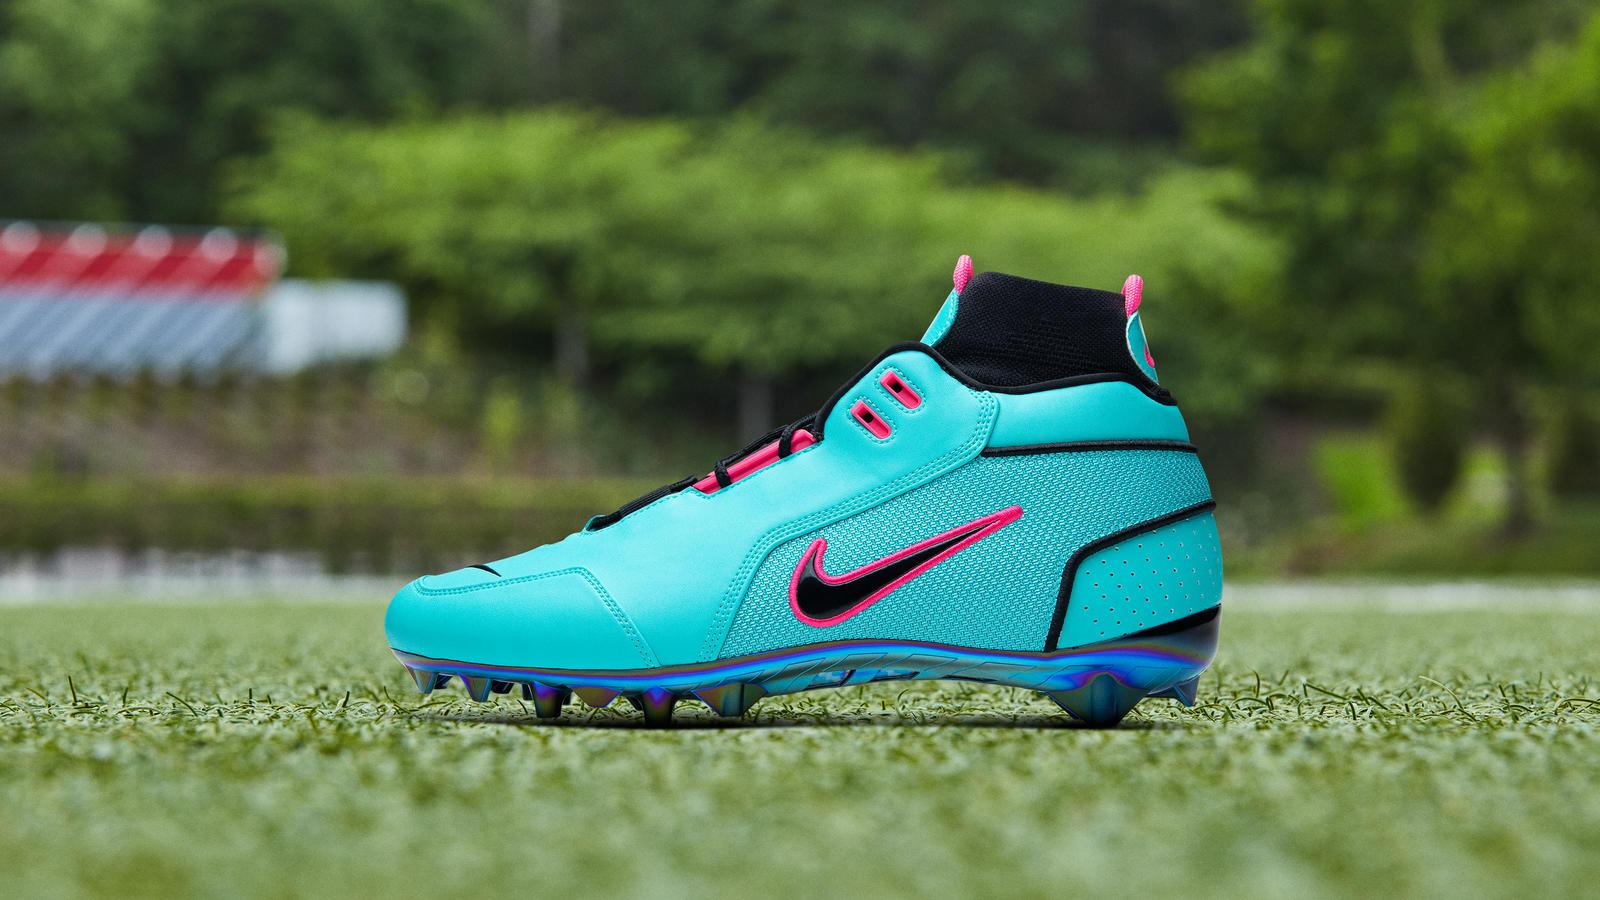 OBJ Odell Beckham Jr. Week 12 Nike